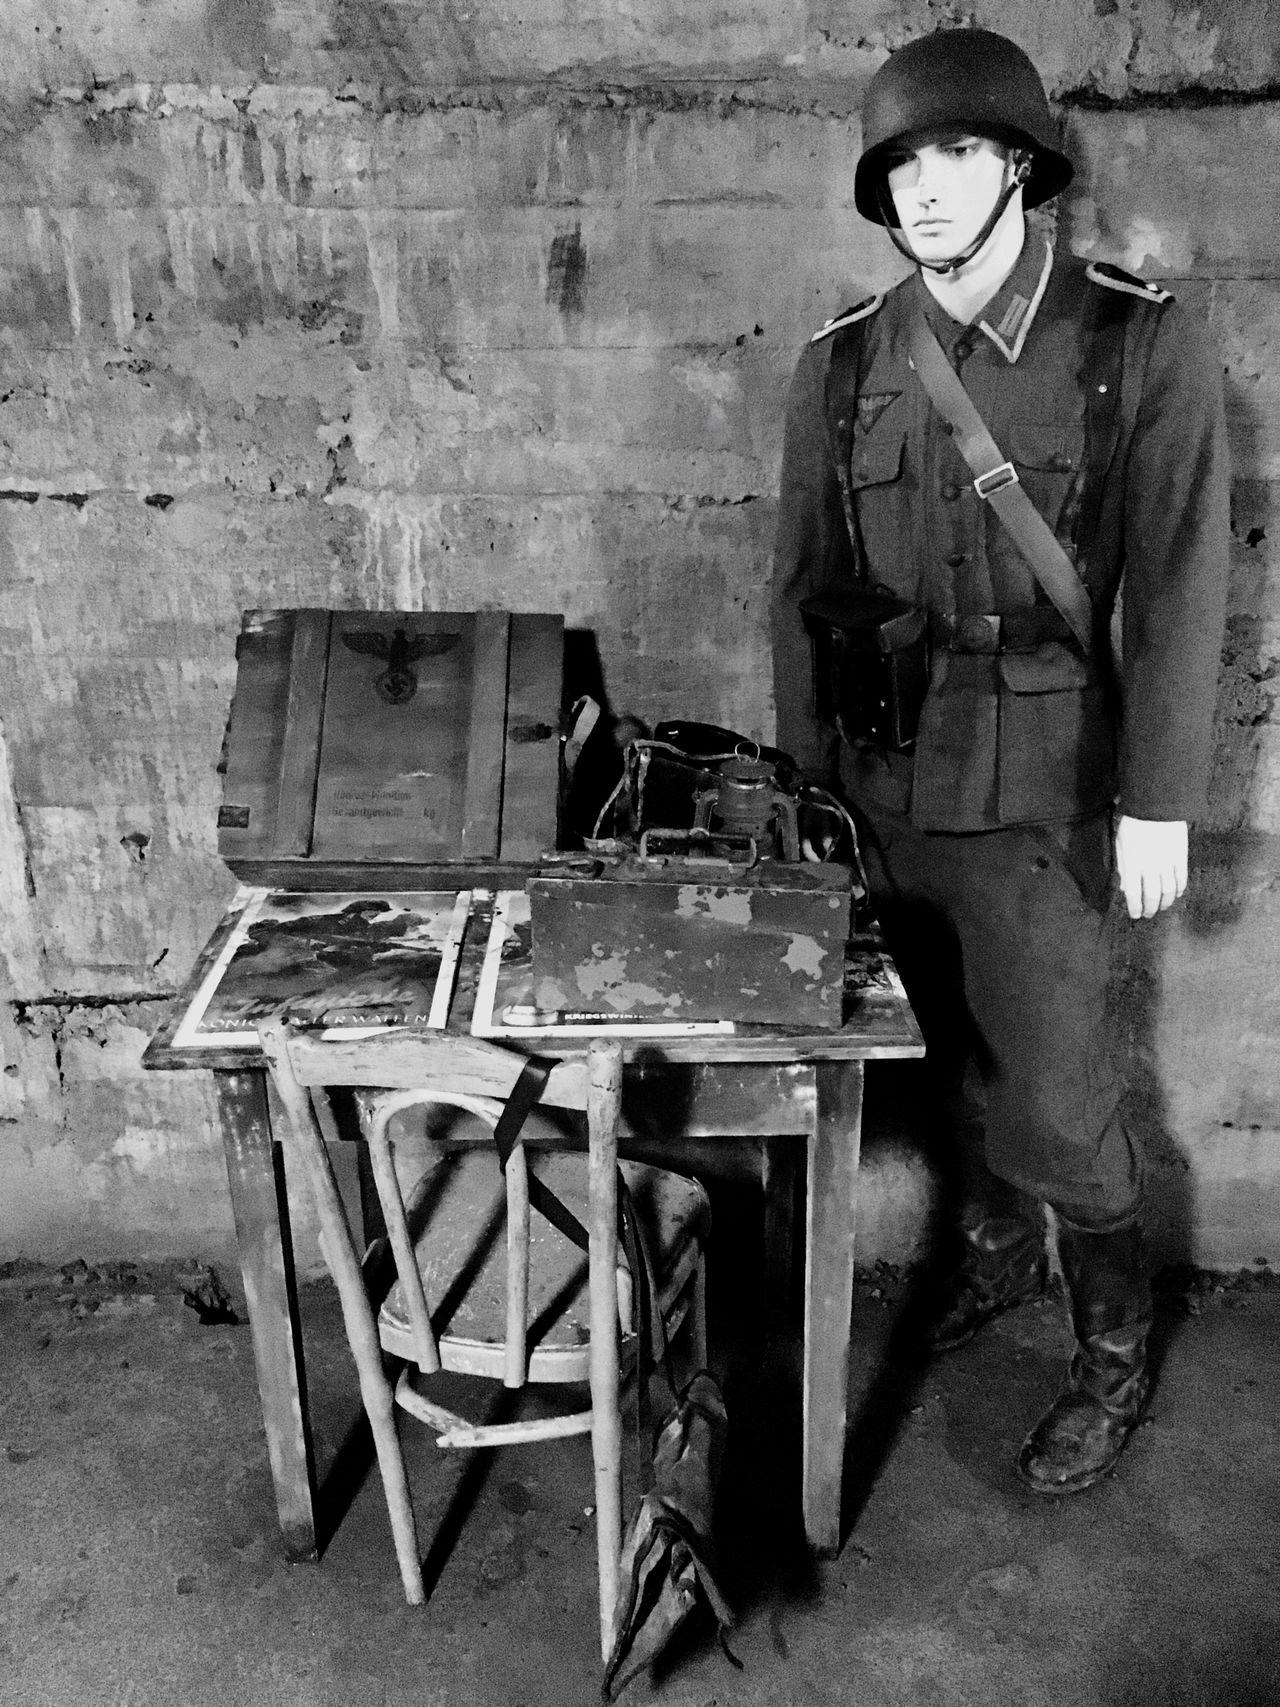 Soldat Military Uniform Krieg War